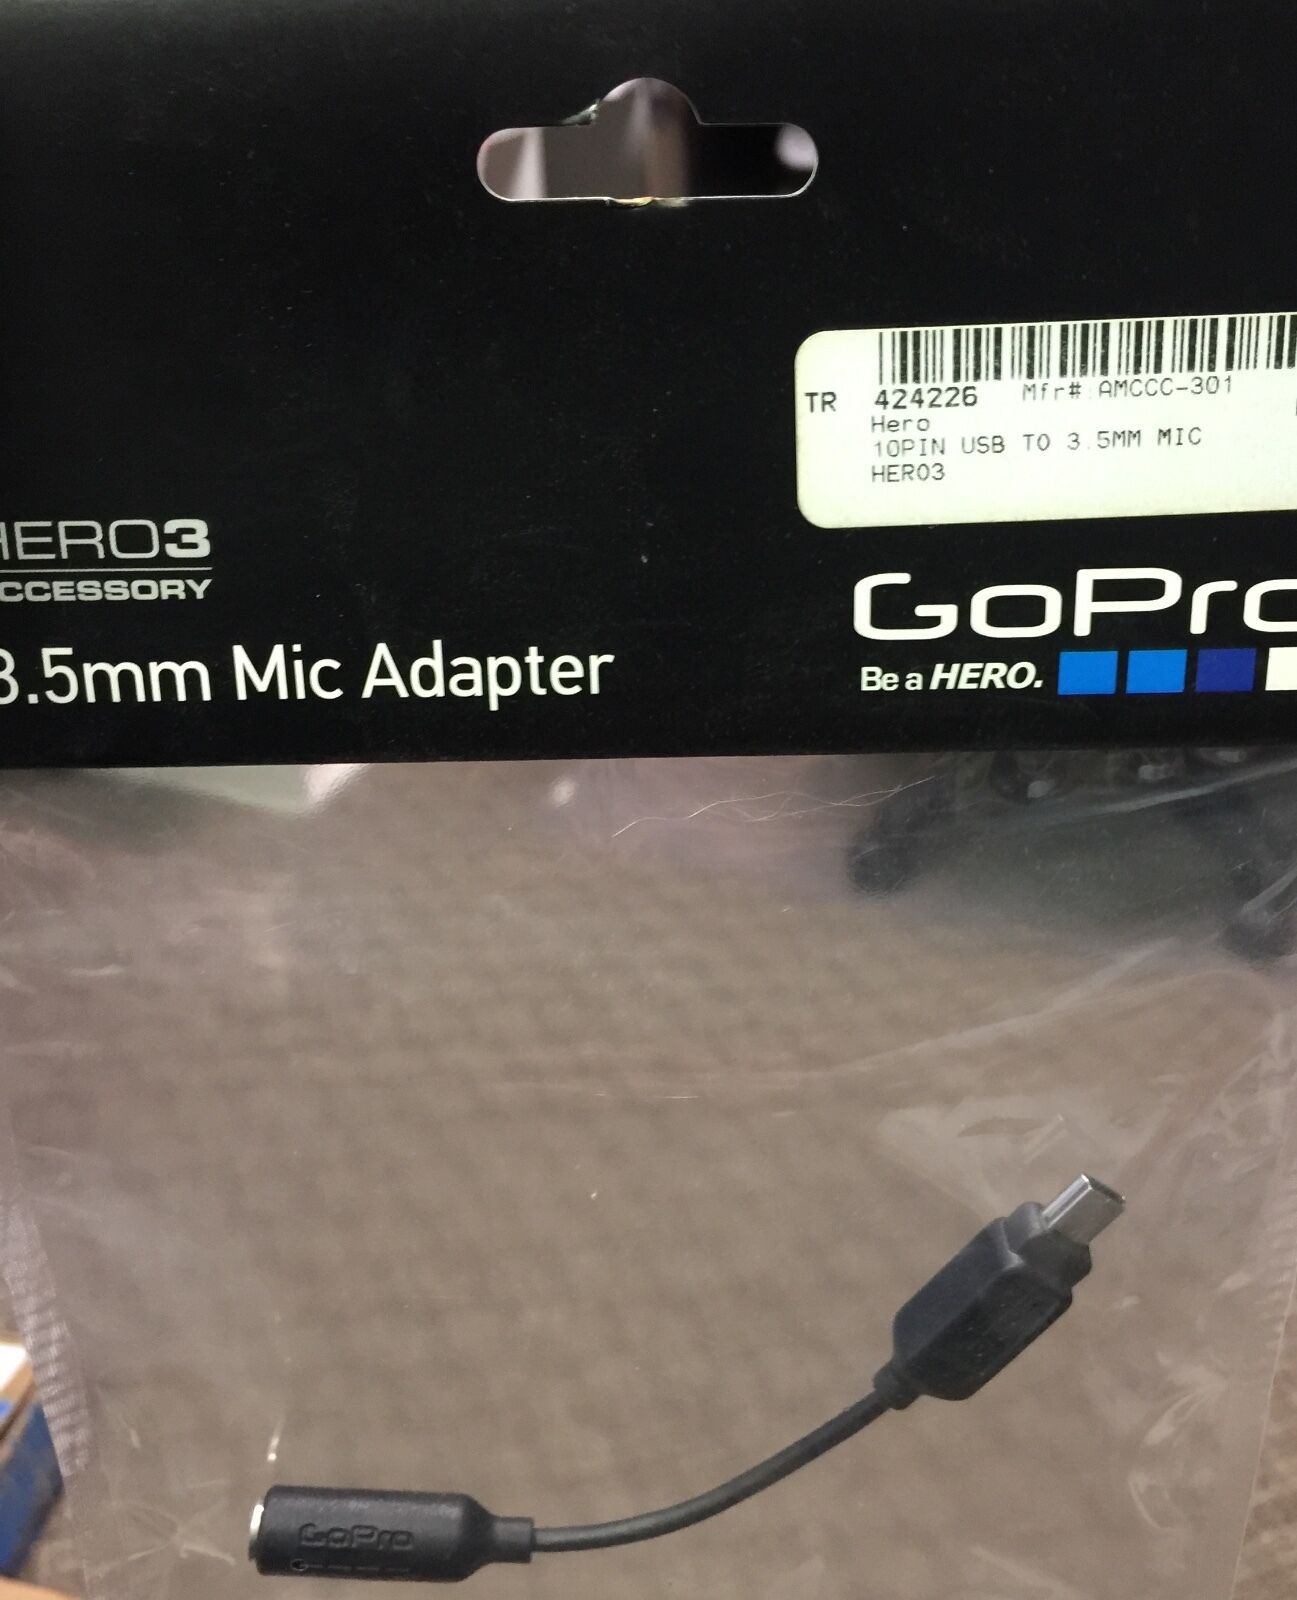 GOPRO 3.5MM MIC ADAPTER HERO3+HERO4+LAPEL Microphone Audio Sound Plug Cable plug